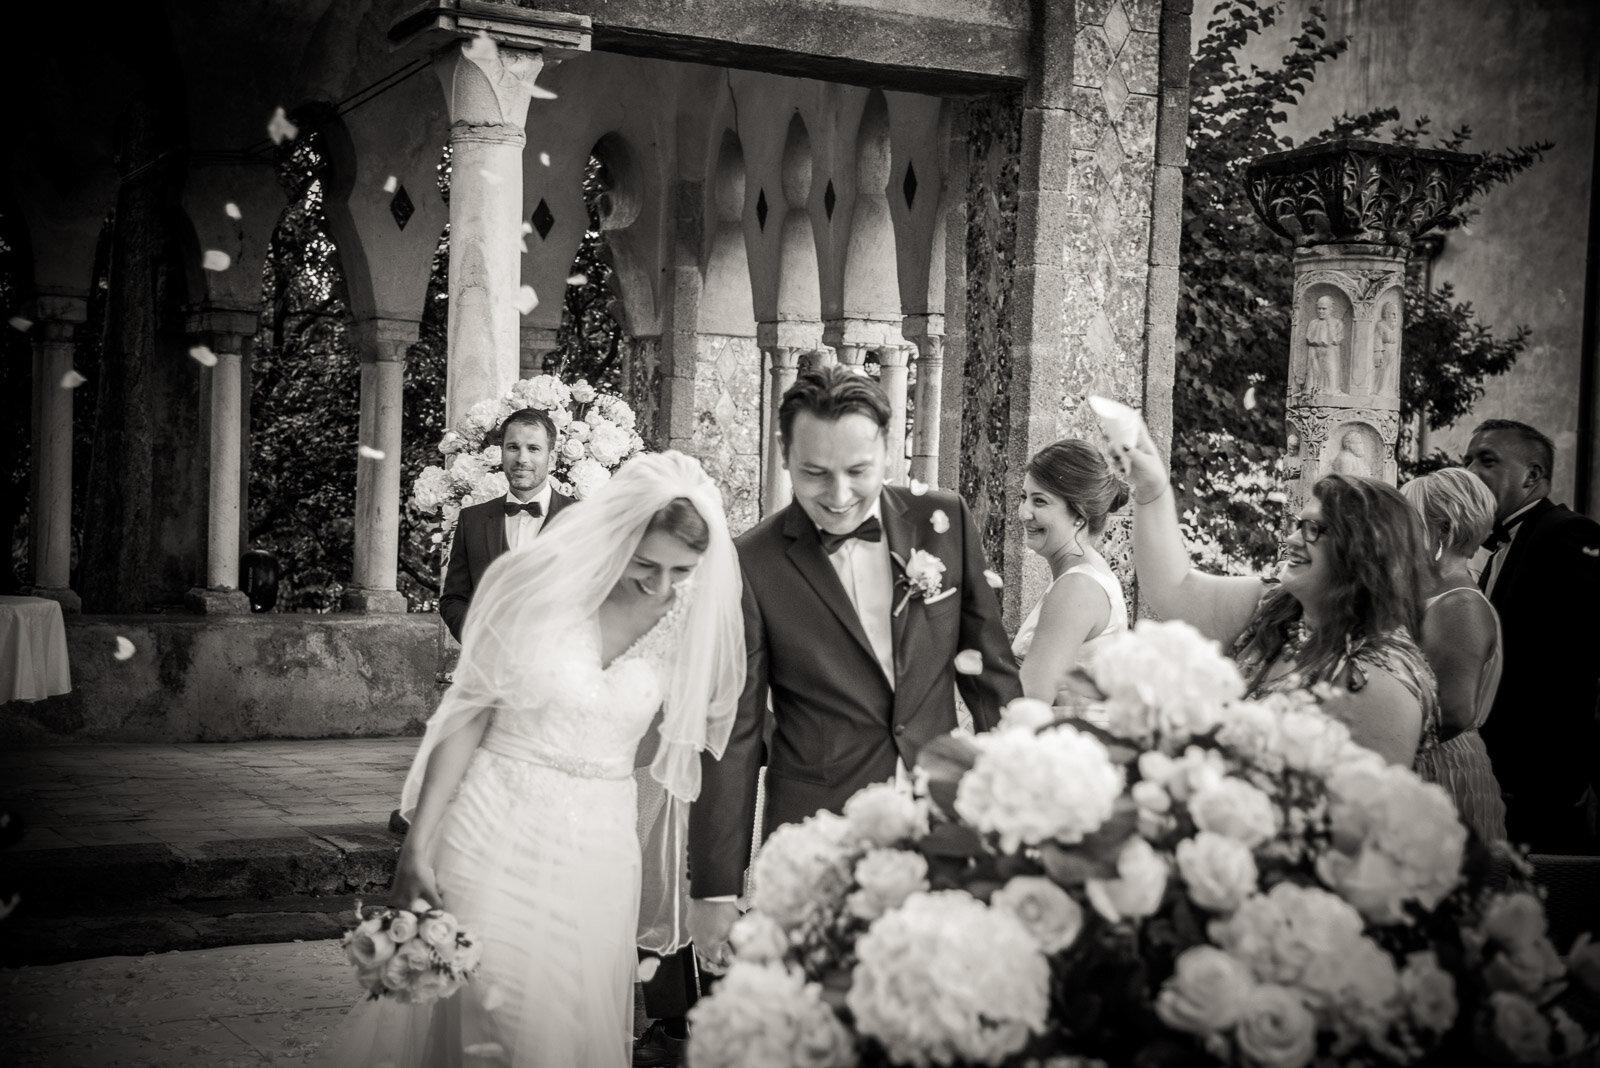 Russian Wedding in Villa Cimbrone Costiera Amalfitana 14.jpg